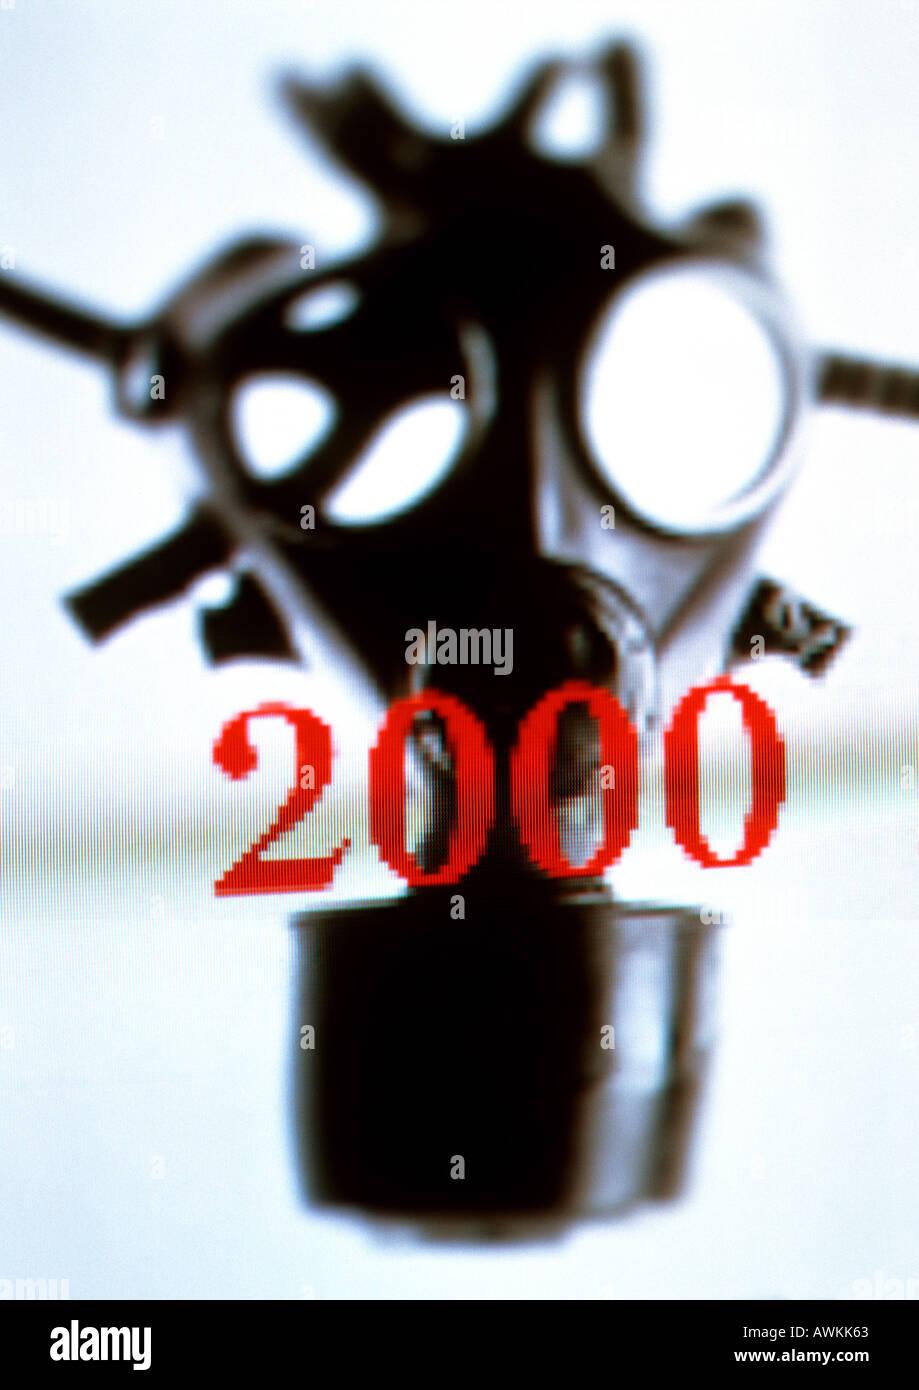 2000 text, gasmask - Stock Image